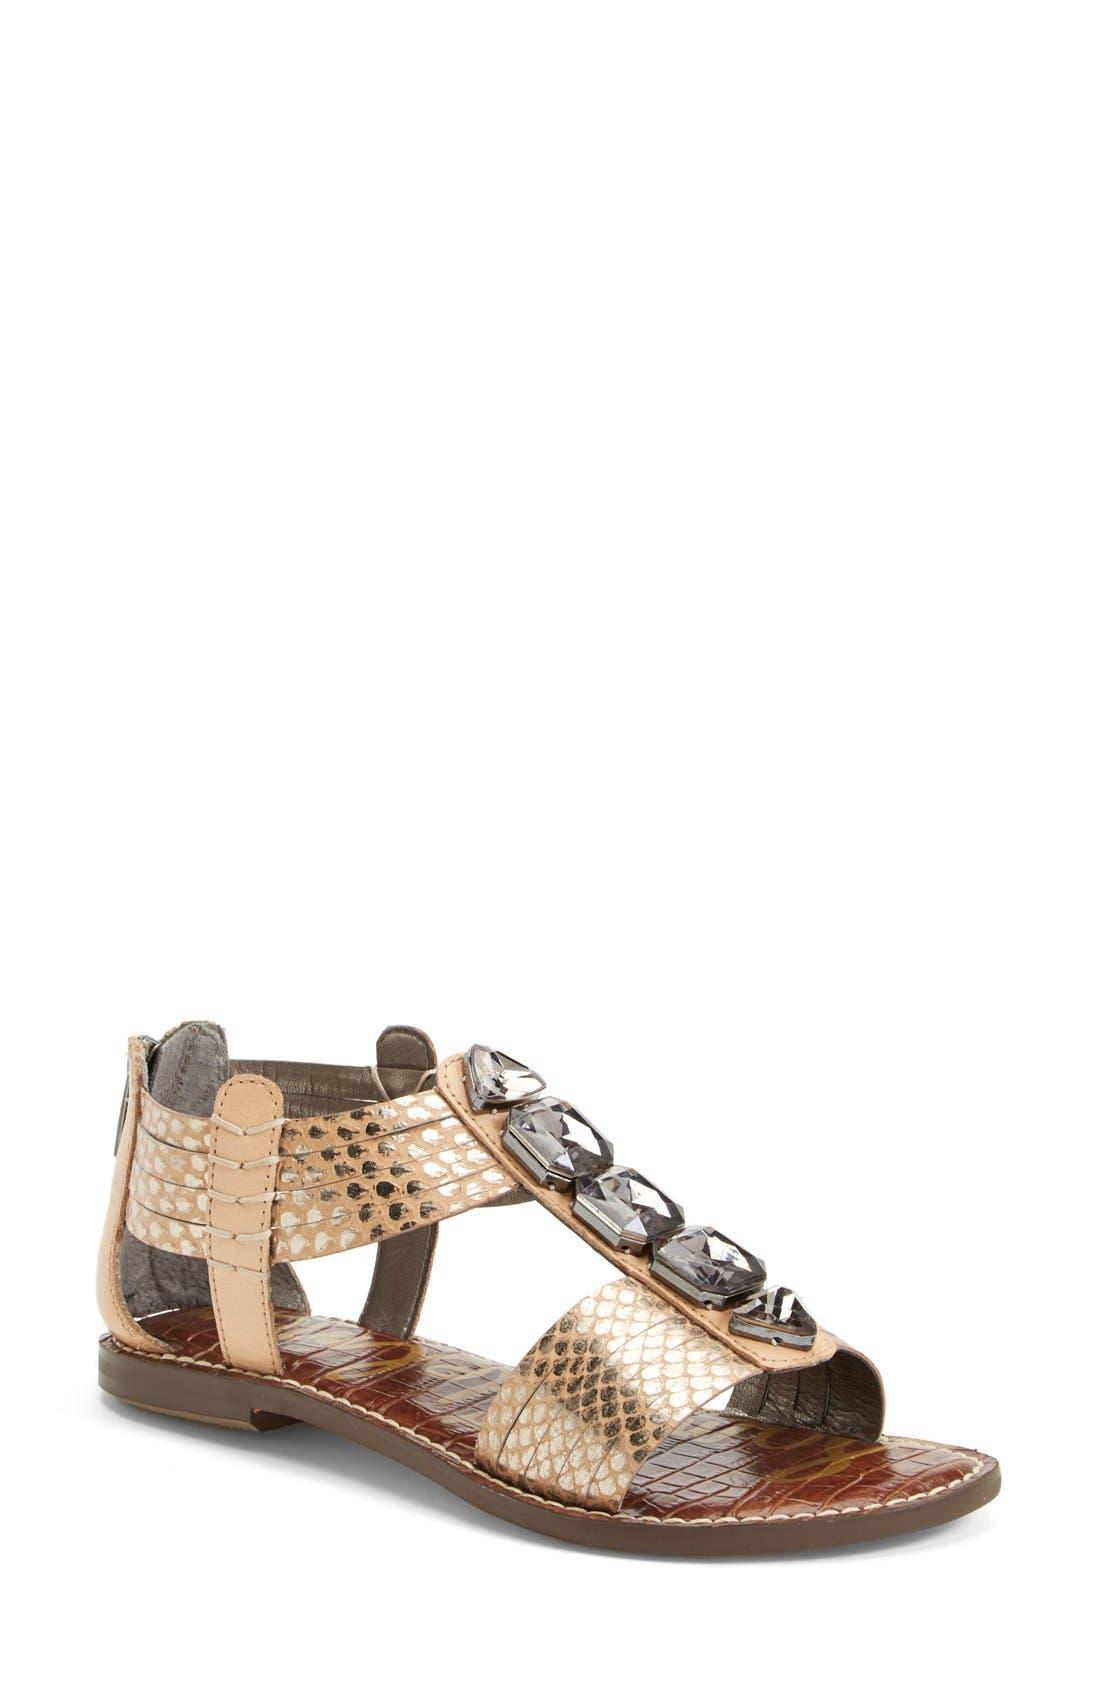 Alternate Image 1 Selected - Sam Edelman 'Galina' Crystal Embellished Sandal (Women)